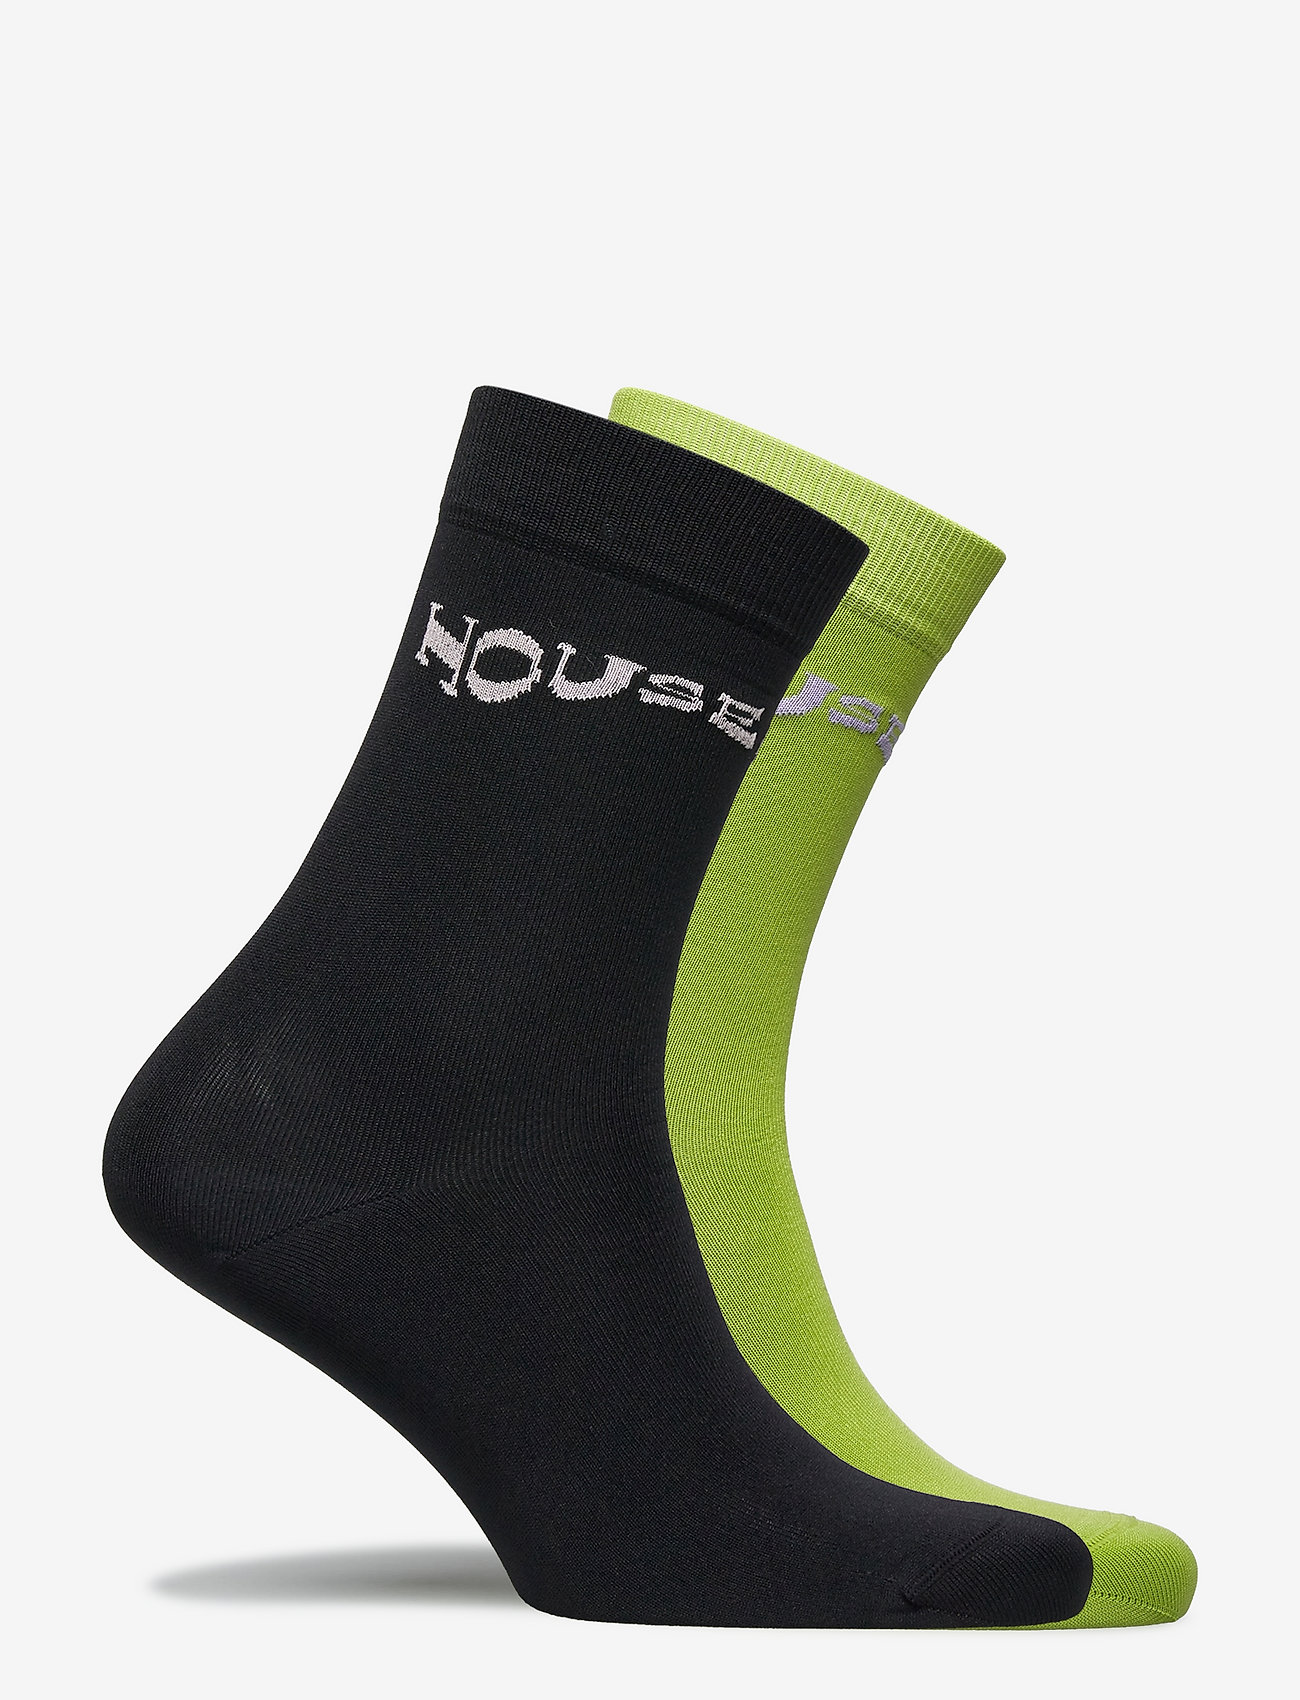 STINE GOYA - Leira, 1207 Rib Socks - almindelige strømper - lime black - 1